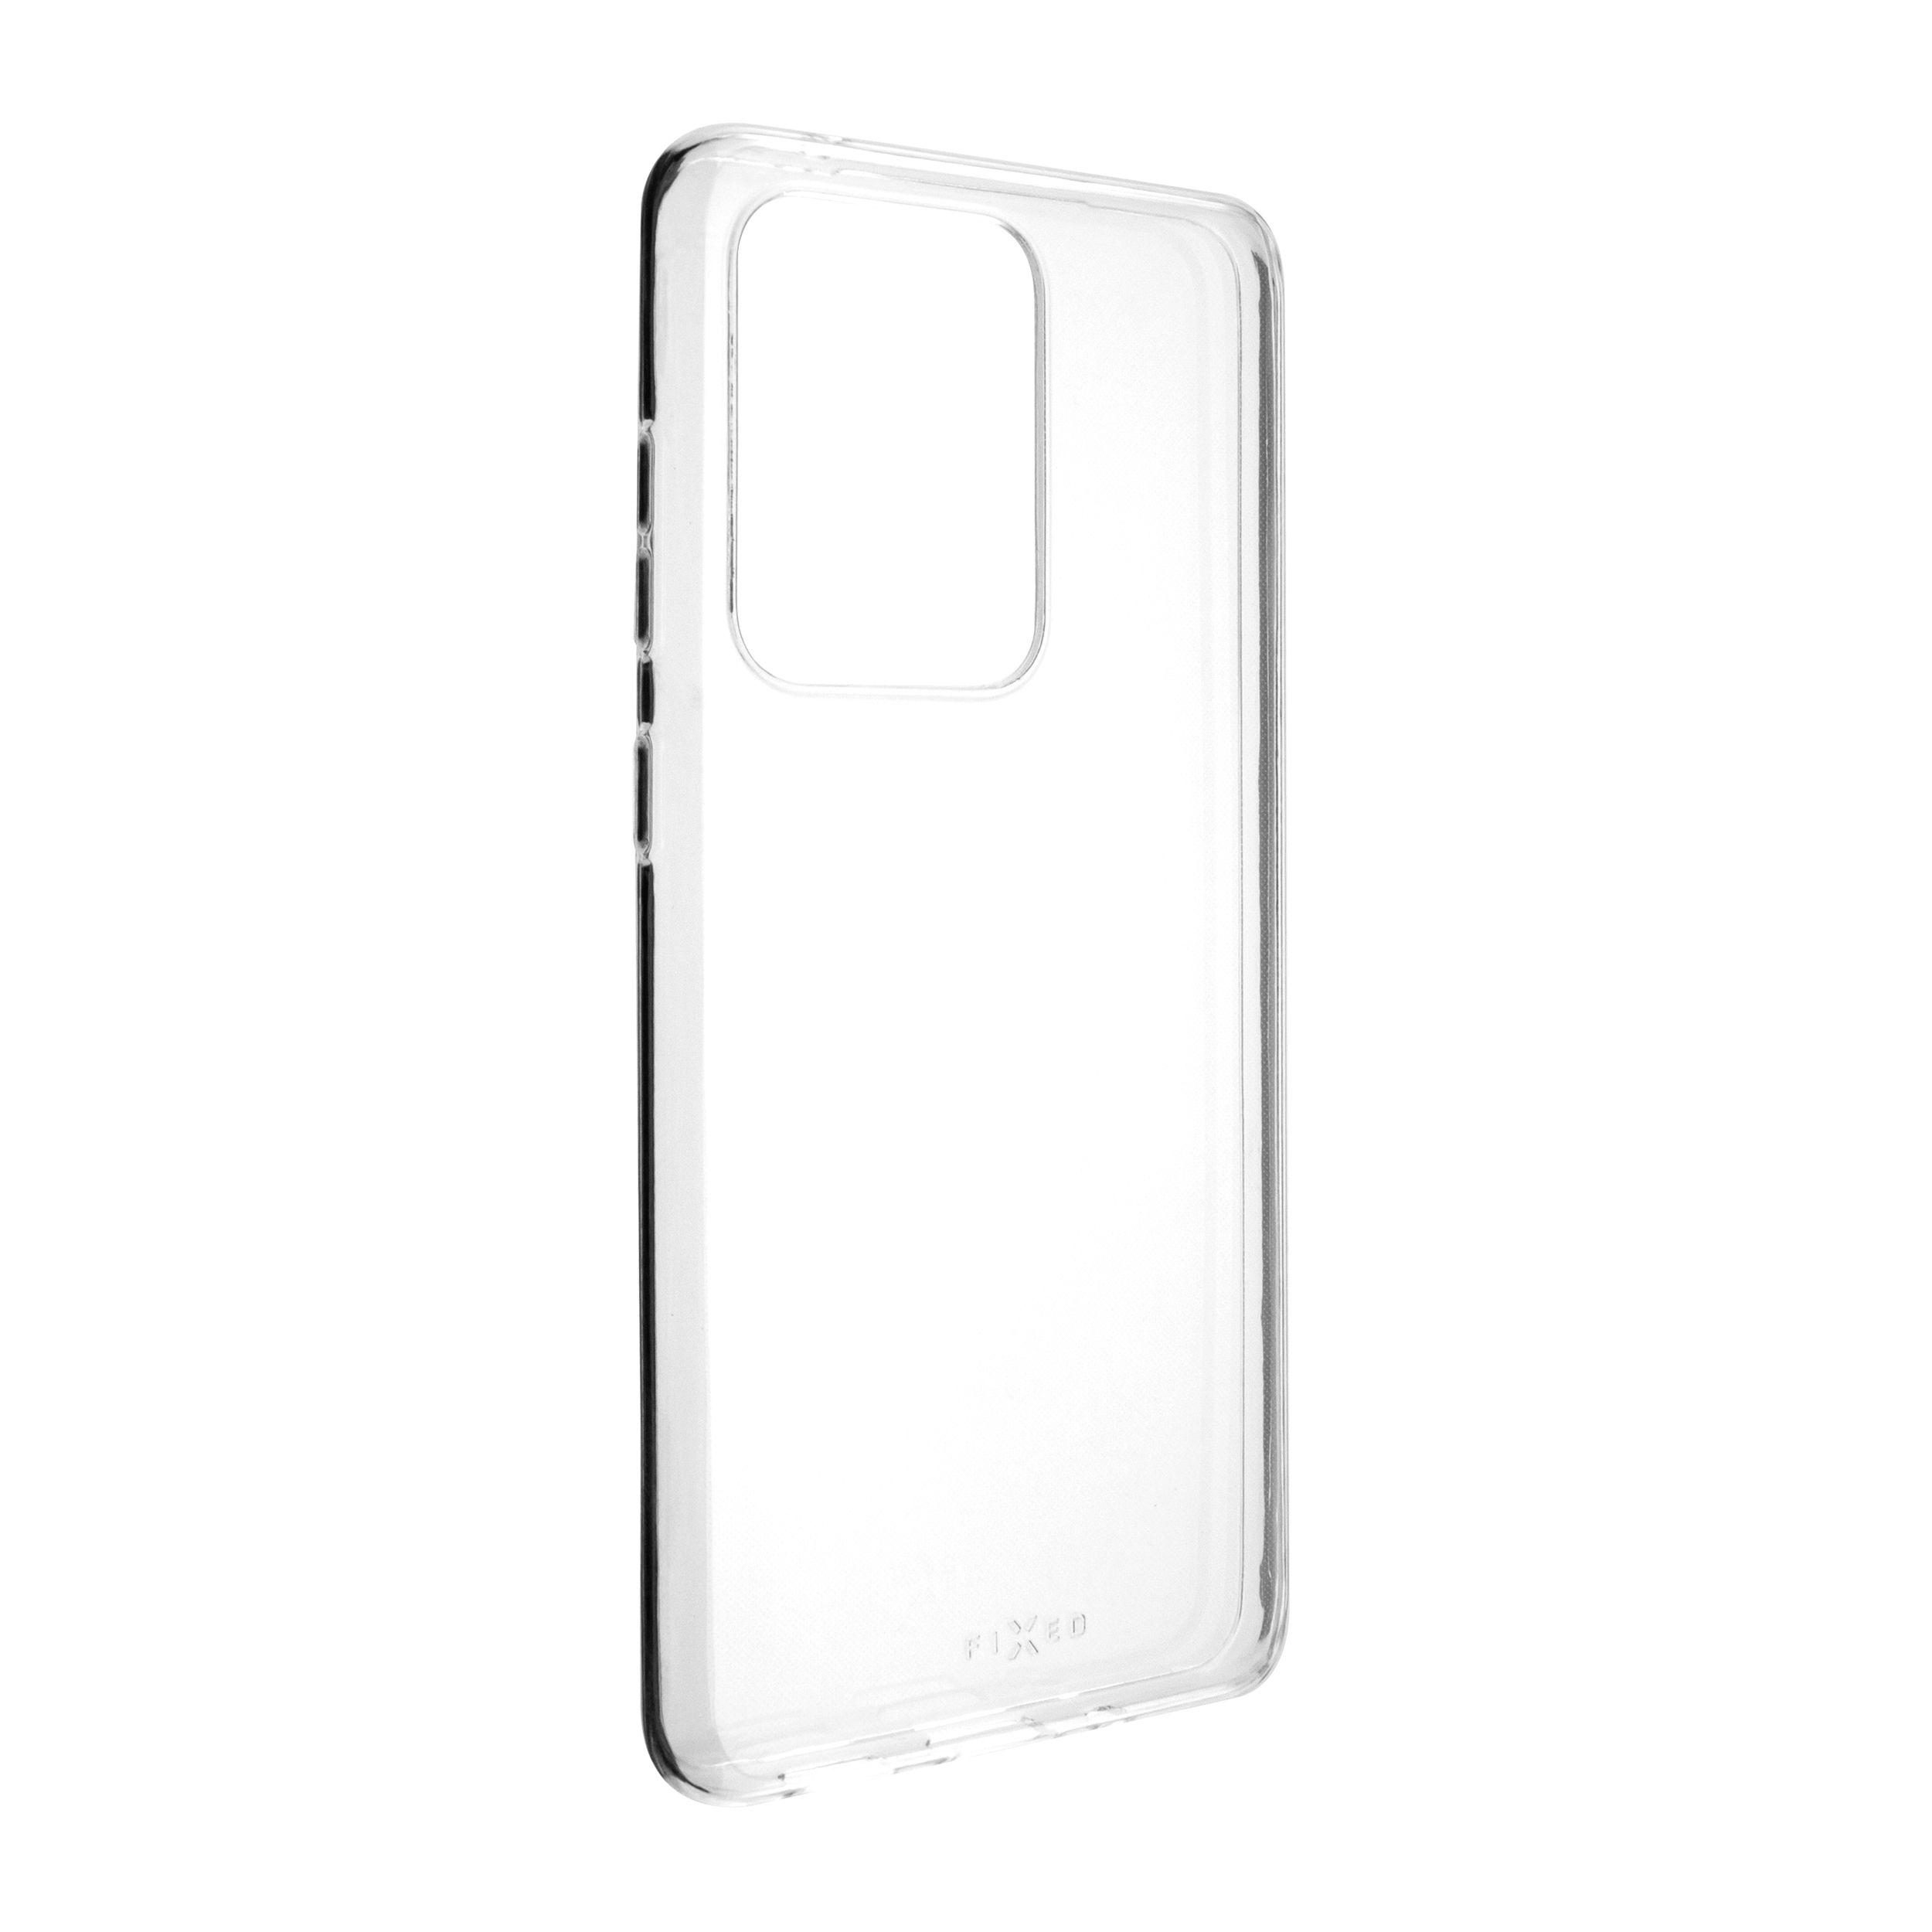 Ultratenké TPU gelové pouzdro FIXED Skin pro Samsung Galaxy S20 Ultra, 0,6 mm, čiré